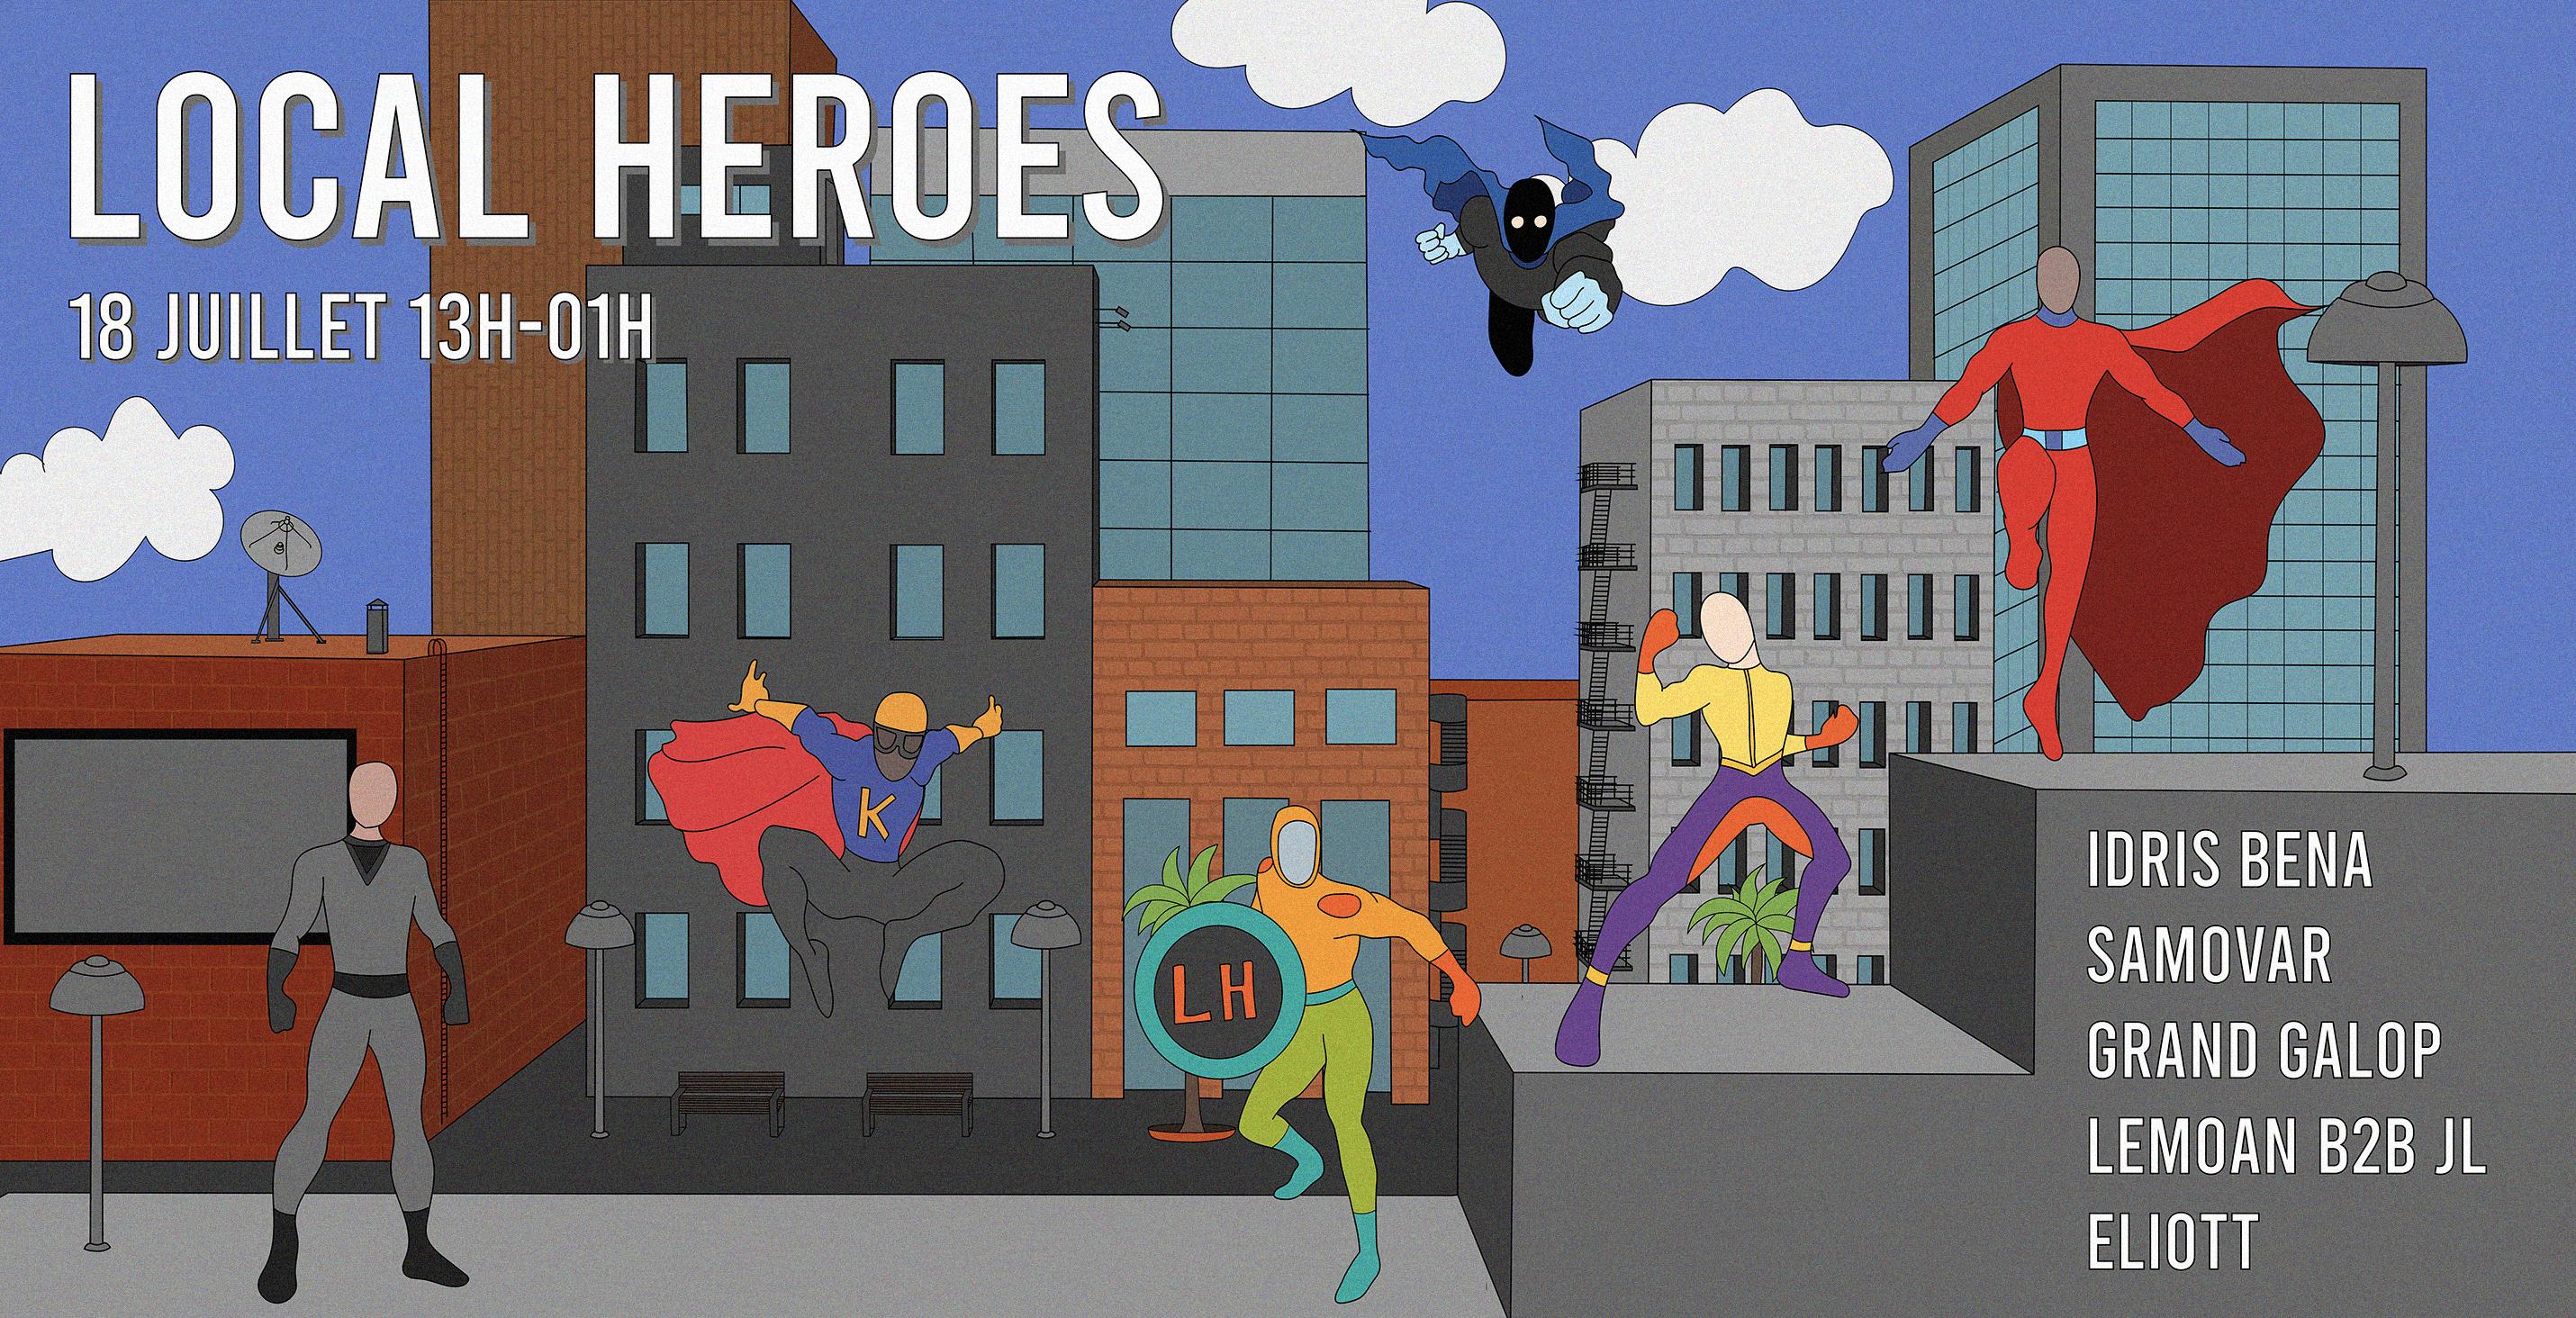 Local Heroes x L'espace Imaginaire (OPEN AIR)